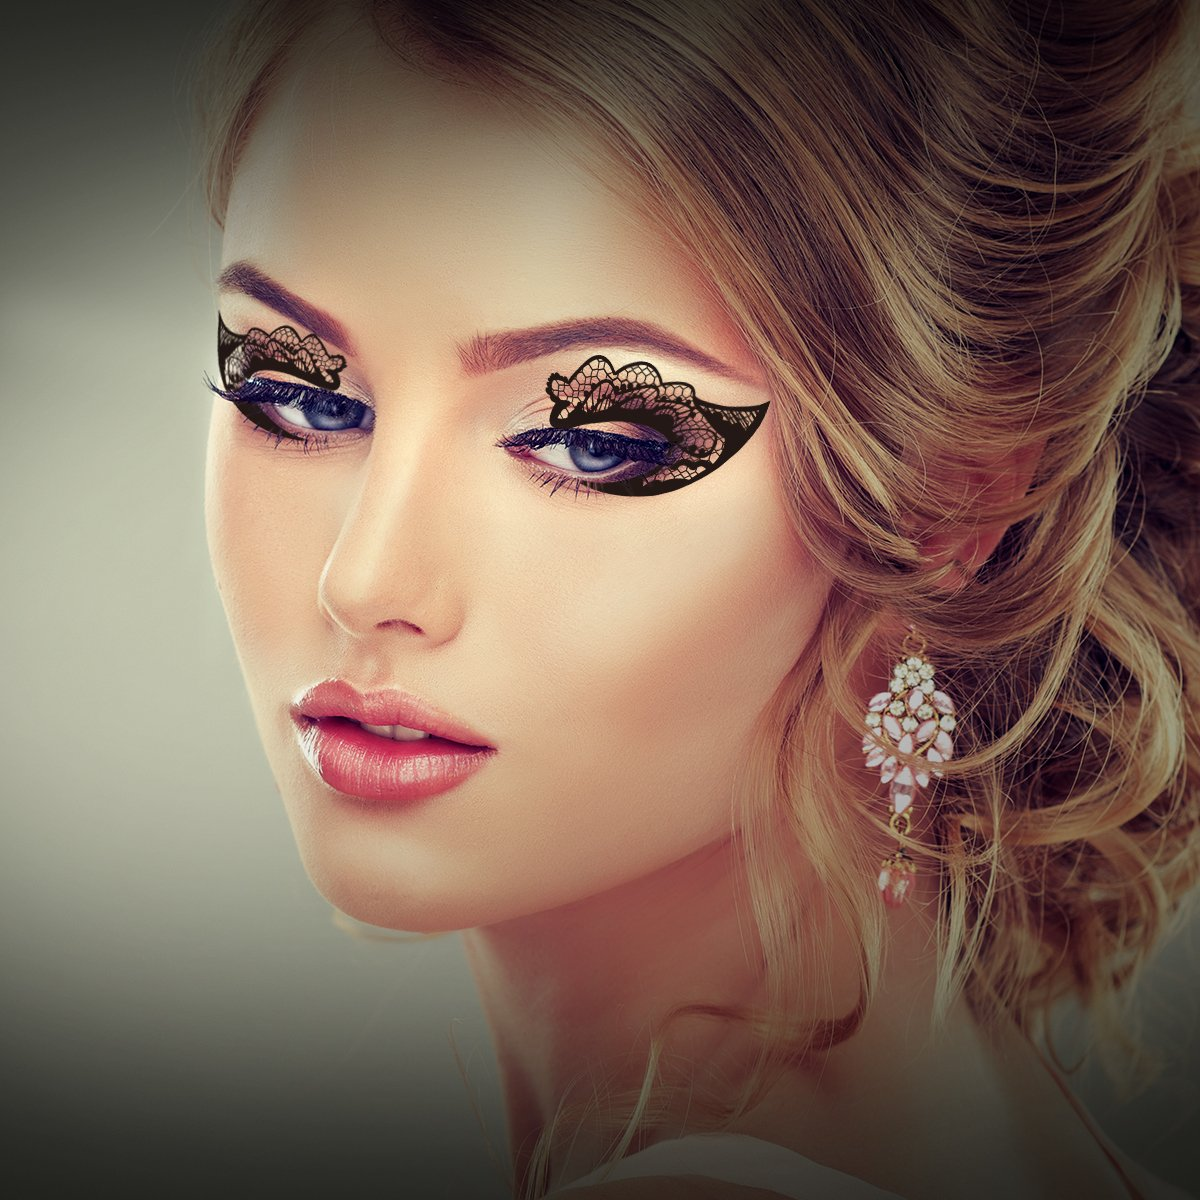 Temporary Eye Tattoo, 18 Pairs Eye Tattoo Stickers with Waterproof Eyeshadow and Eyeliner Designs